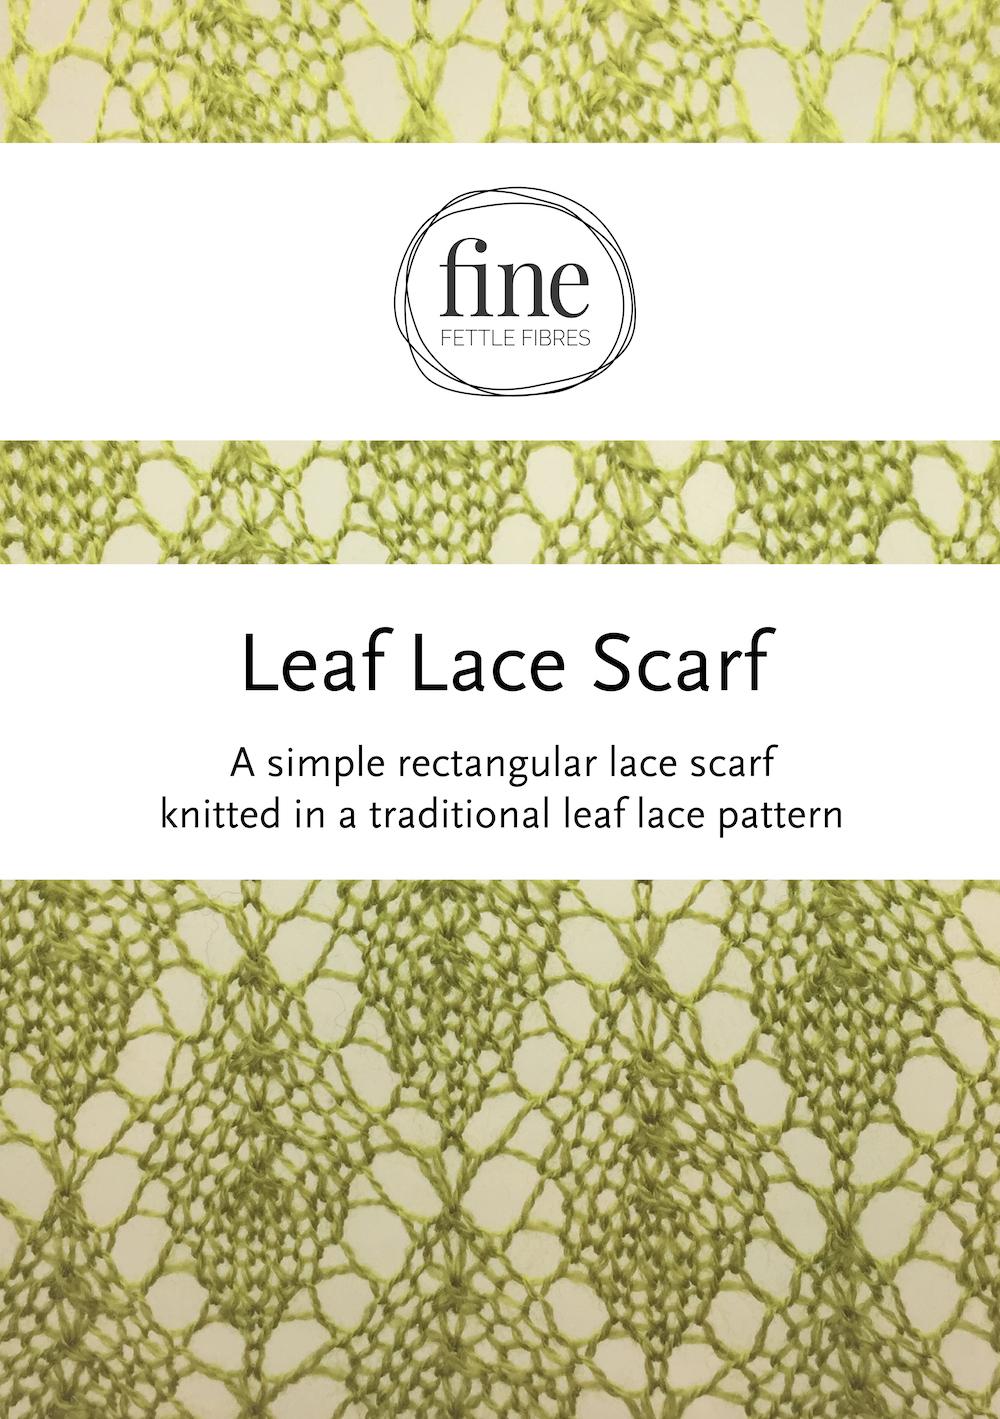 Dorable Leaf Lace Scarf Knitting Pattern Colección - Manta de Tejer ...